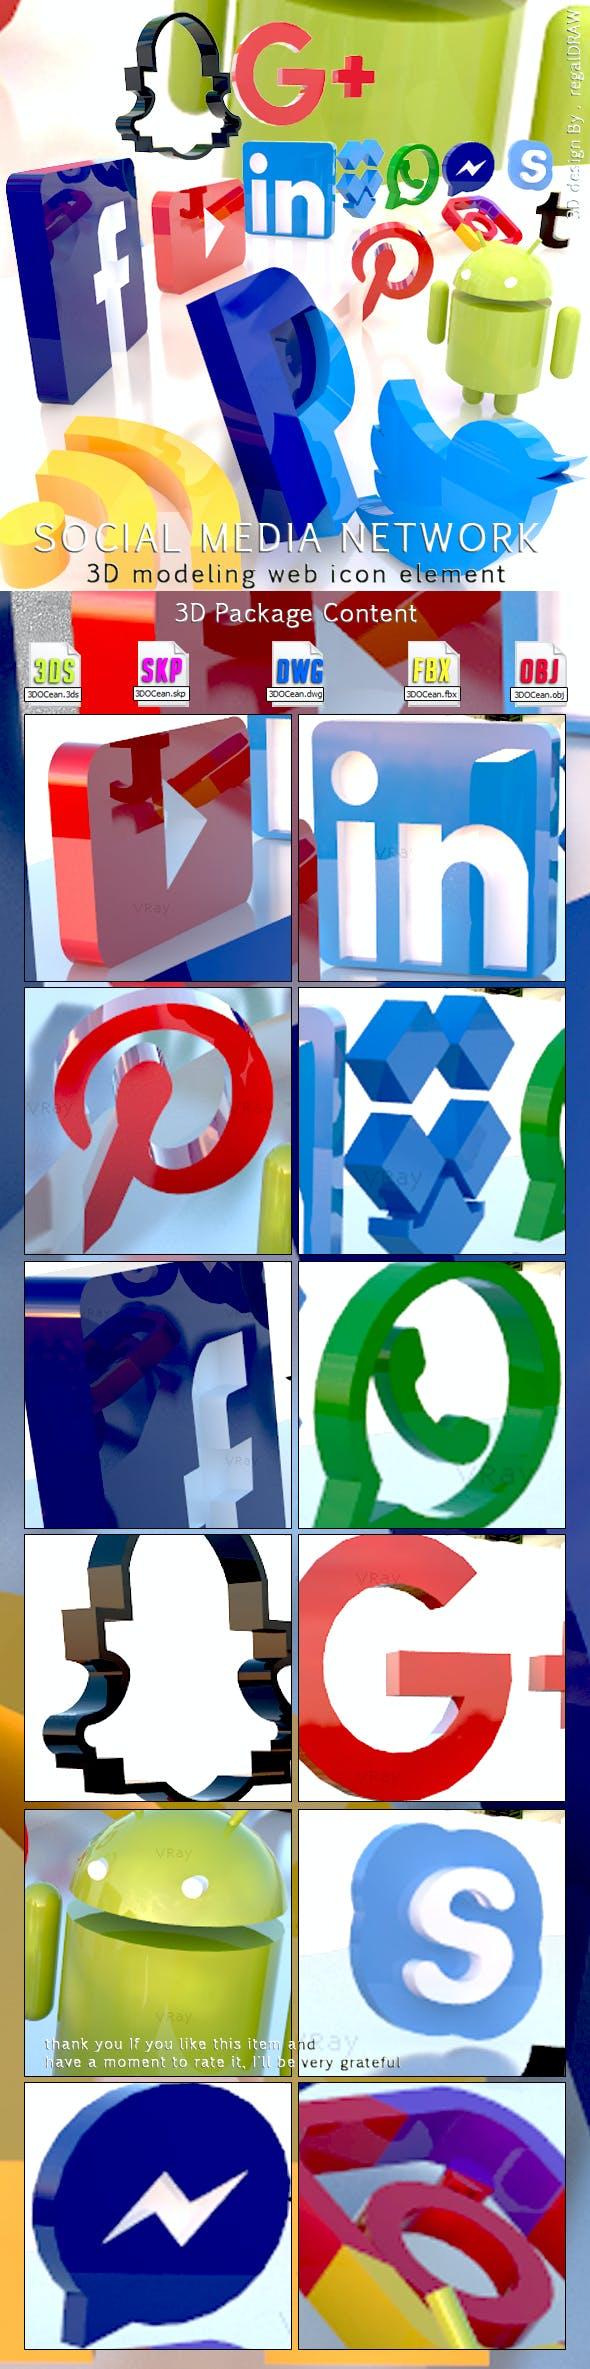 Social Media Network 3D Modeling Web icon Element - 3DOcean Item for Sale